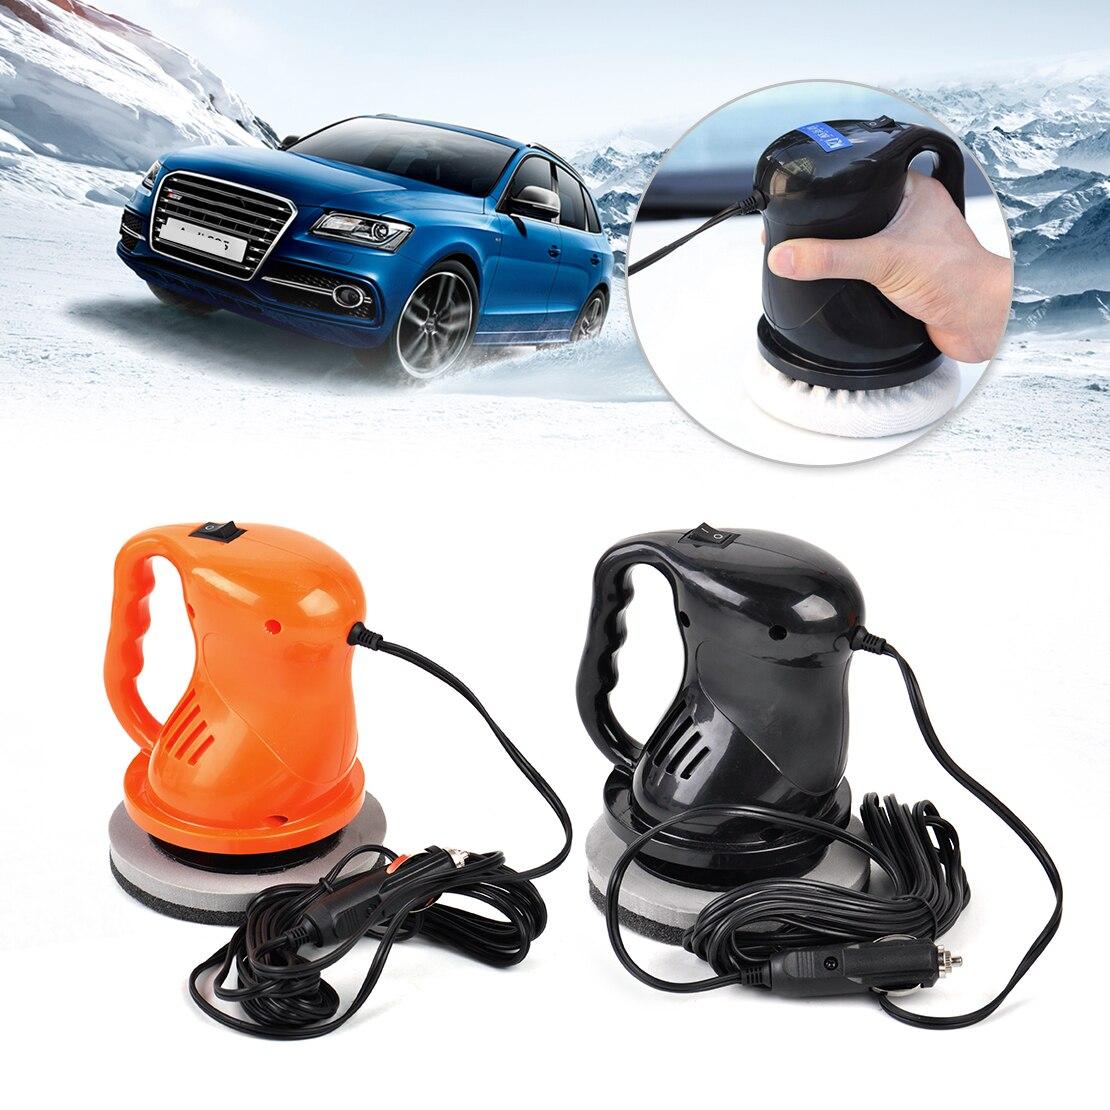 CITALL 1pc black / orange 12V 40W Electric Car Polishing Buffing Waxing Machine Home Outdoor Waxer Polisher